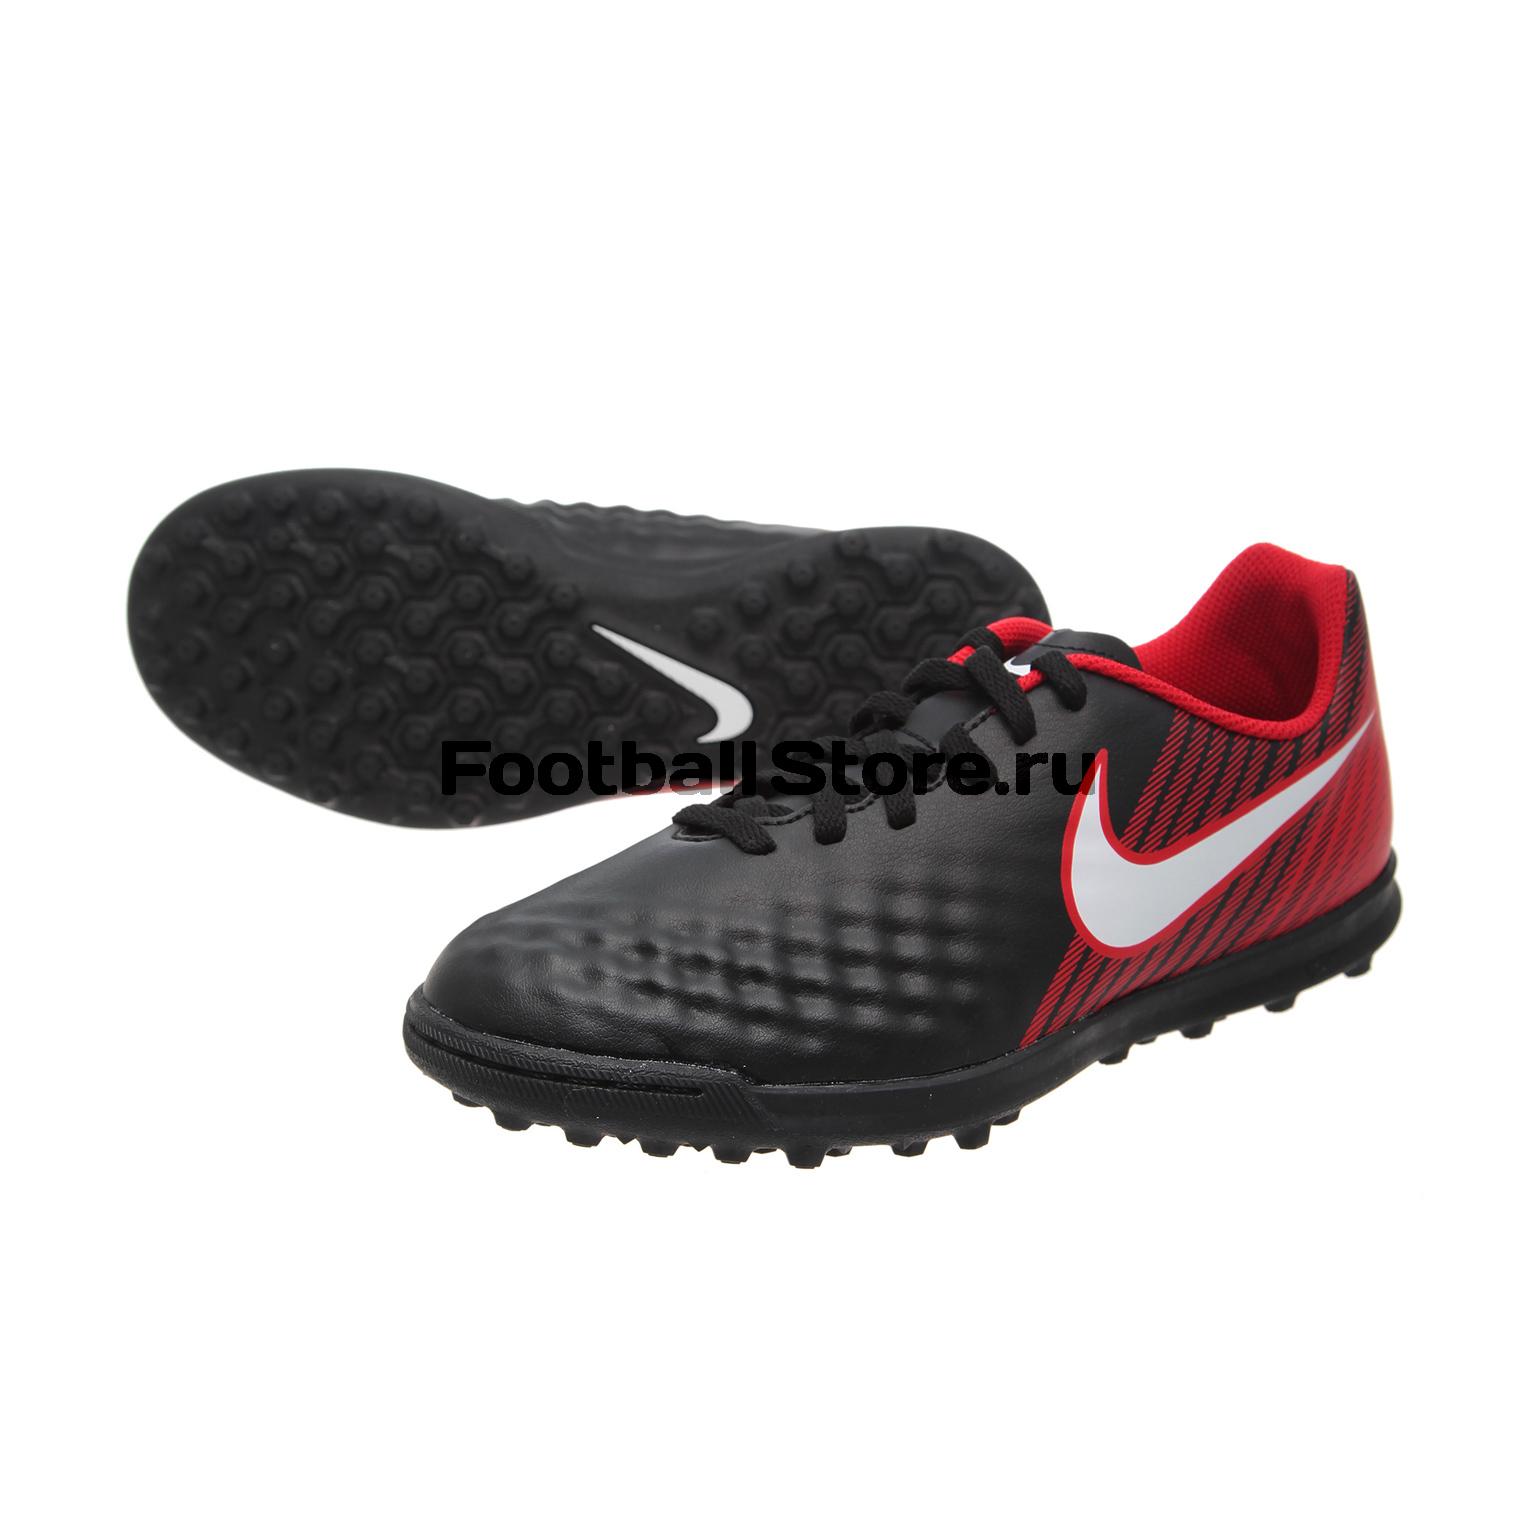 Шиповки Nike JR MagistaX Ola II TF 844416-061 шиповки nike magistax finale ii se tf 897738 004 sr чер гол